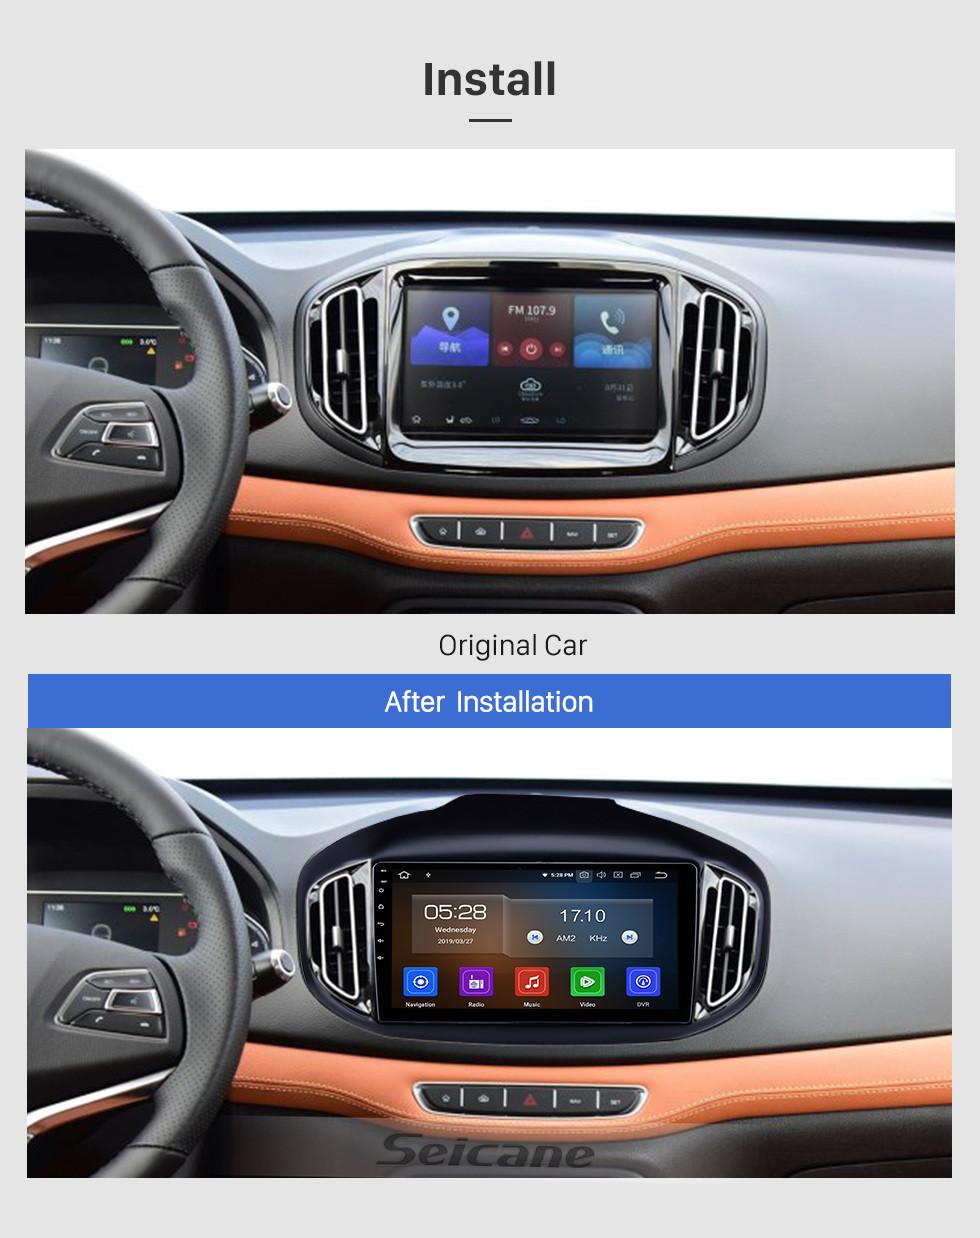 Seicane 10,1 Zoll Android 9.0 Radio für 2016-2018 Chery Tiggo 7 Bluetooth HD Touchscreen GPS-Navigation Carplay USB-Unterstützung TPMS DAB +